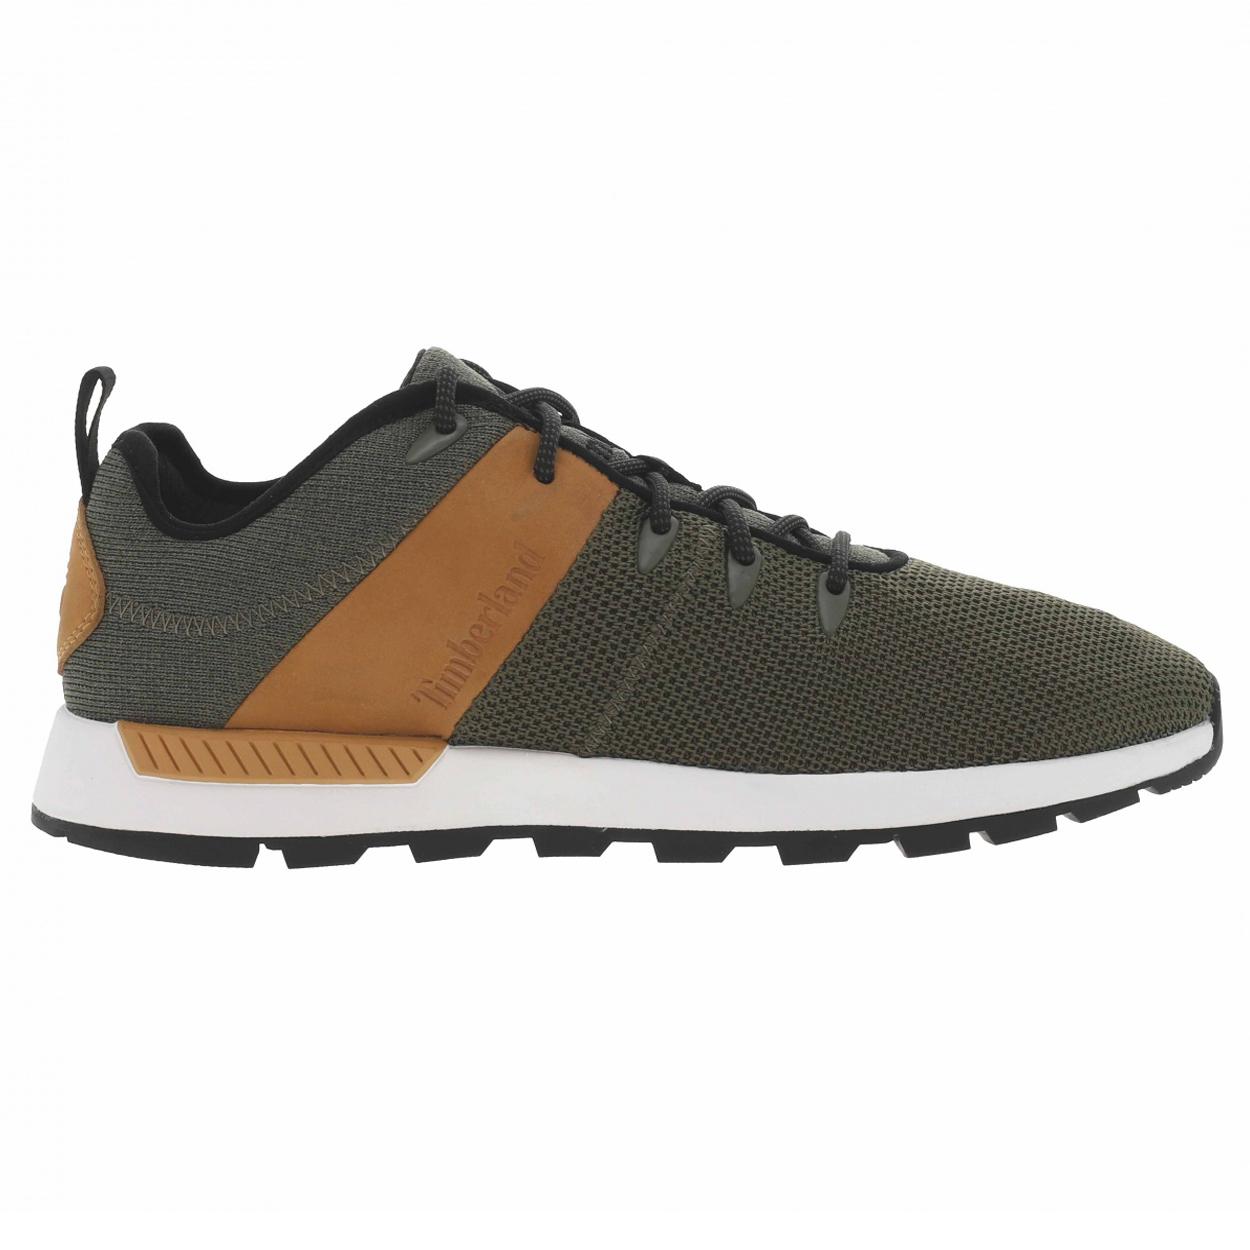 Chaussures mi-hautes  sprint trekker en toile kaki et cuir camel